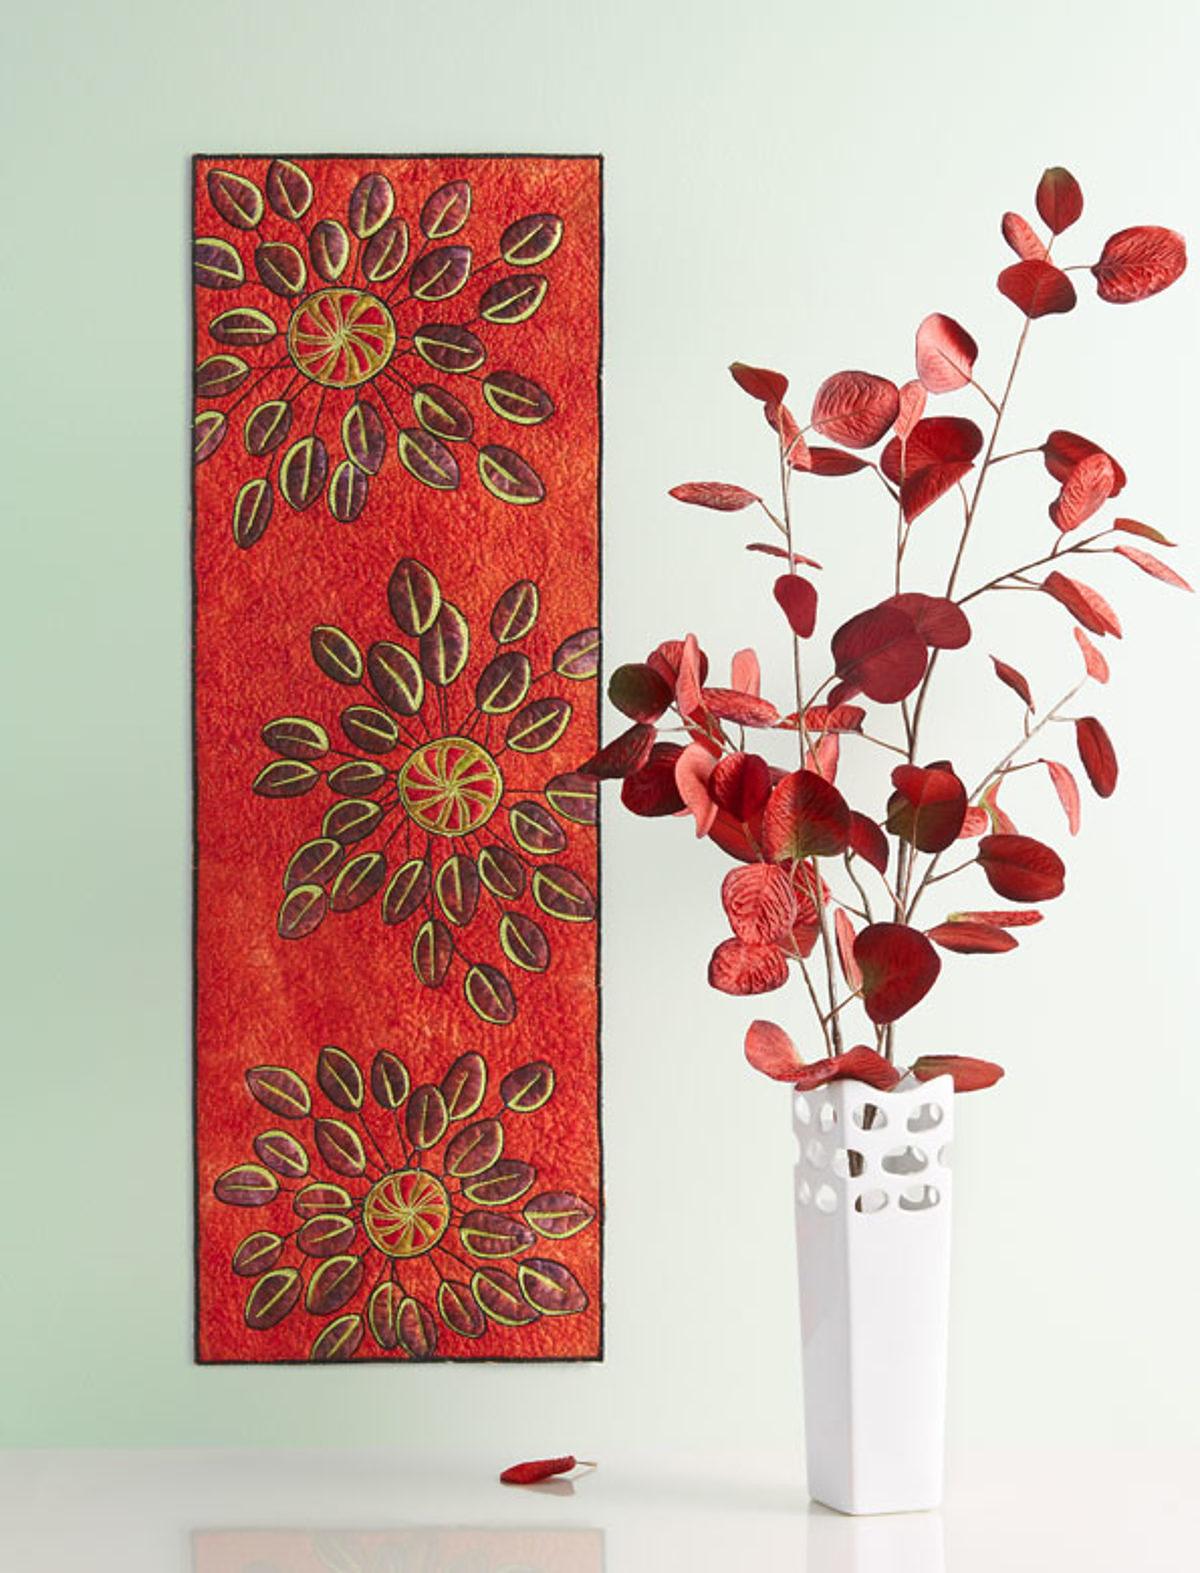 dijanne cevaal art textile